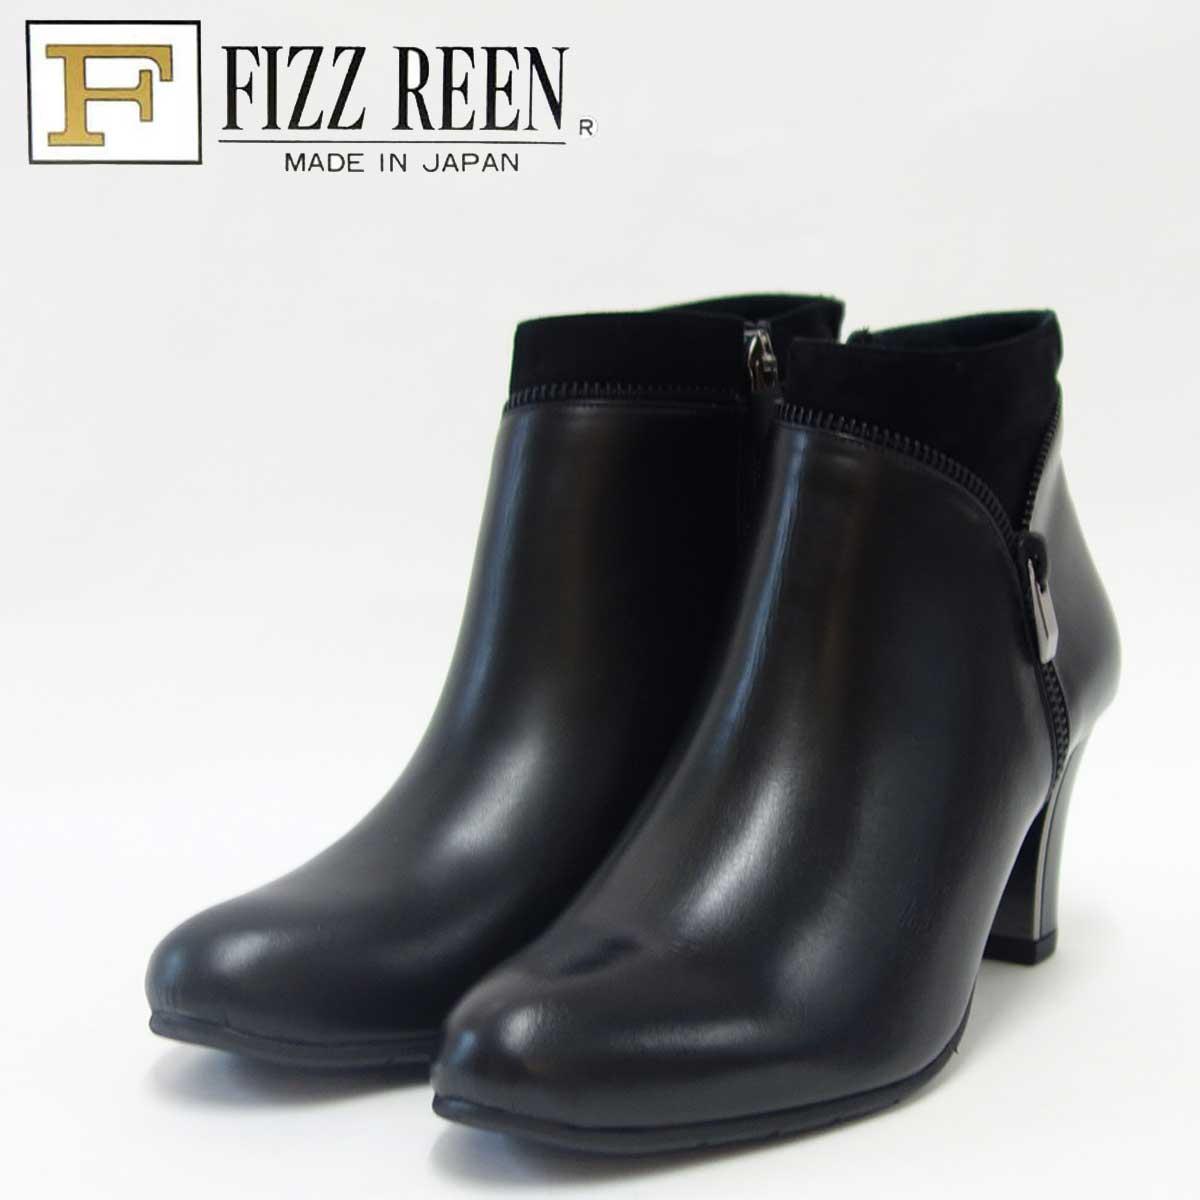 FIZZ REEN フィズリーン 7651 ブラック(日本製)天然皮革のスタイリッシュブーティ「靴」